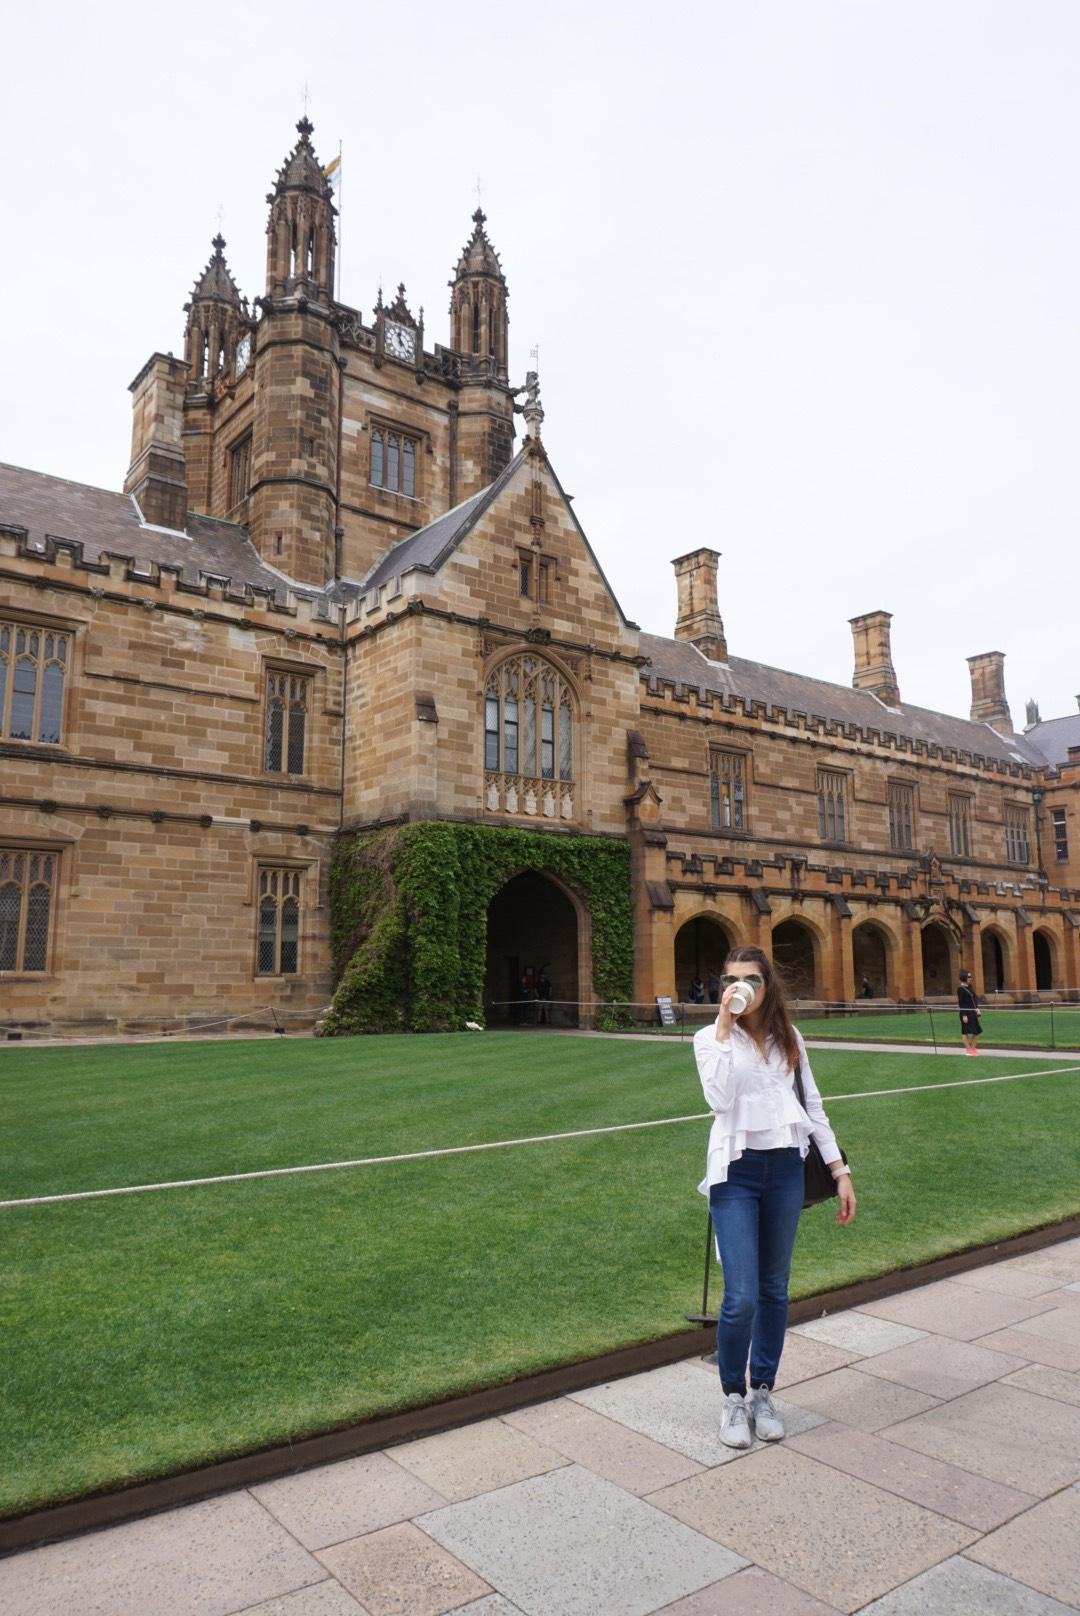 CAPAStudyAbroad_Sydney_Fall2017_From Hanna Okhrimchuk - Visiting the University of Sydney_2.jpeg